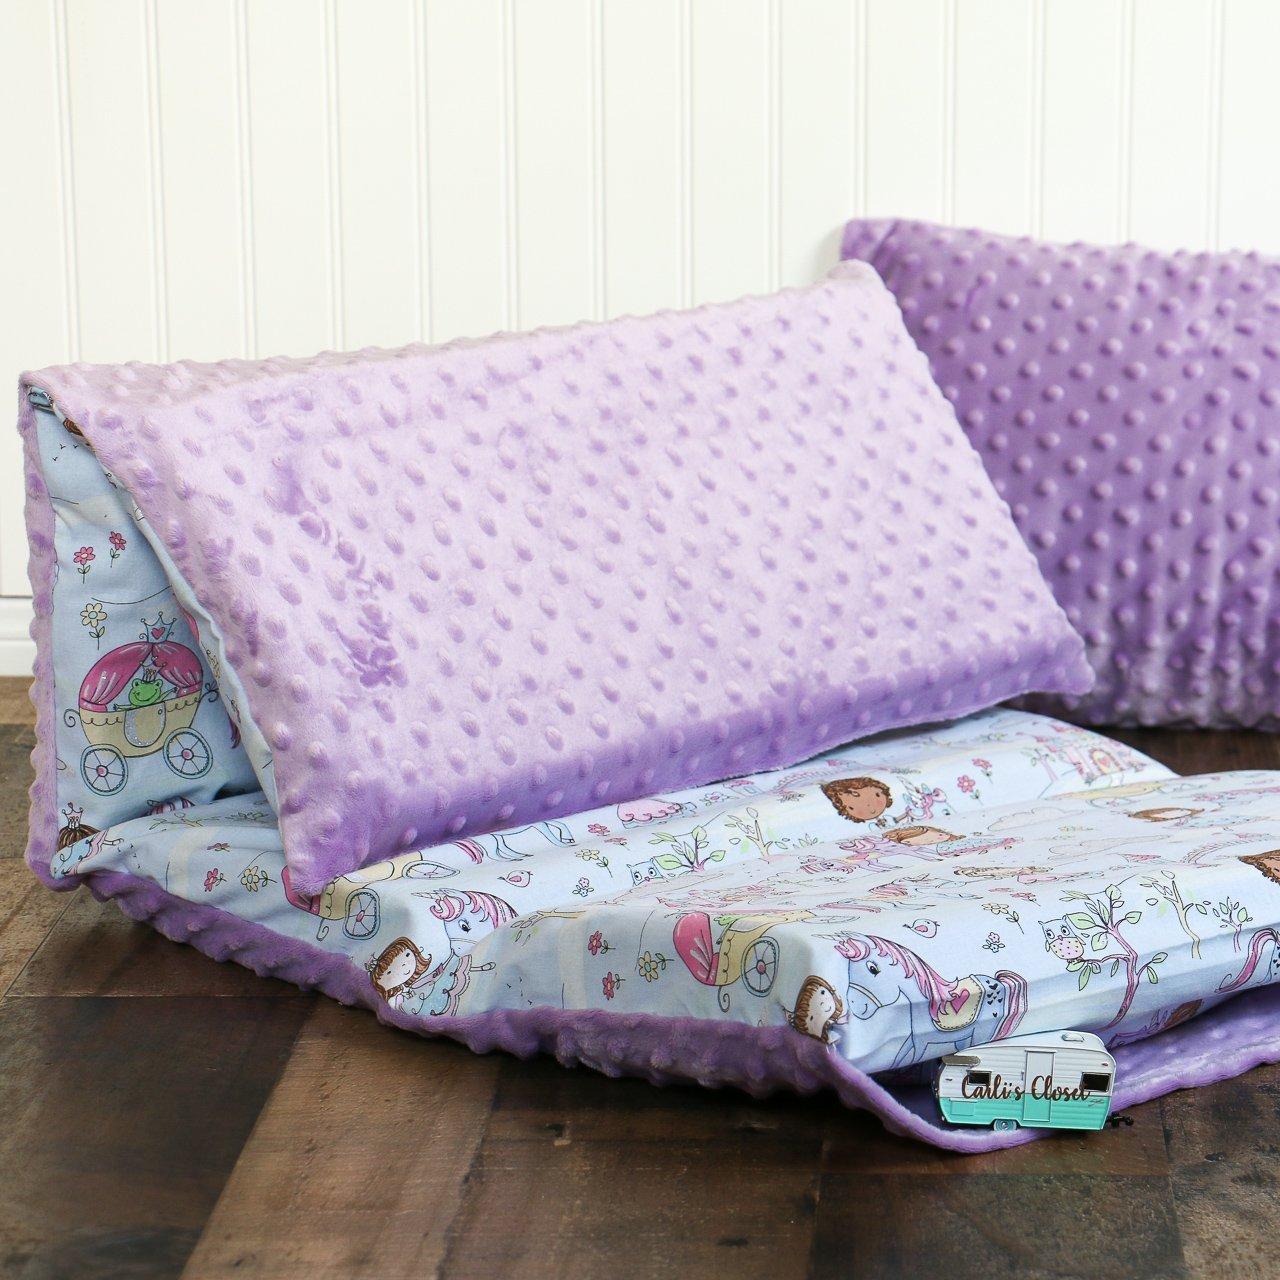 Amazon Unicorn Kindermat Nap Mat Cover For Toddler Girl Handmade